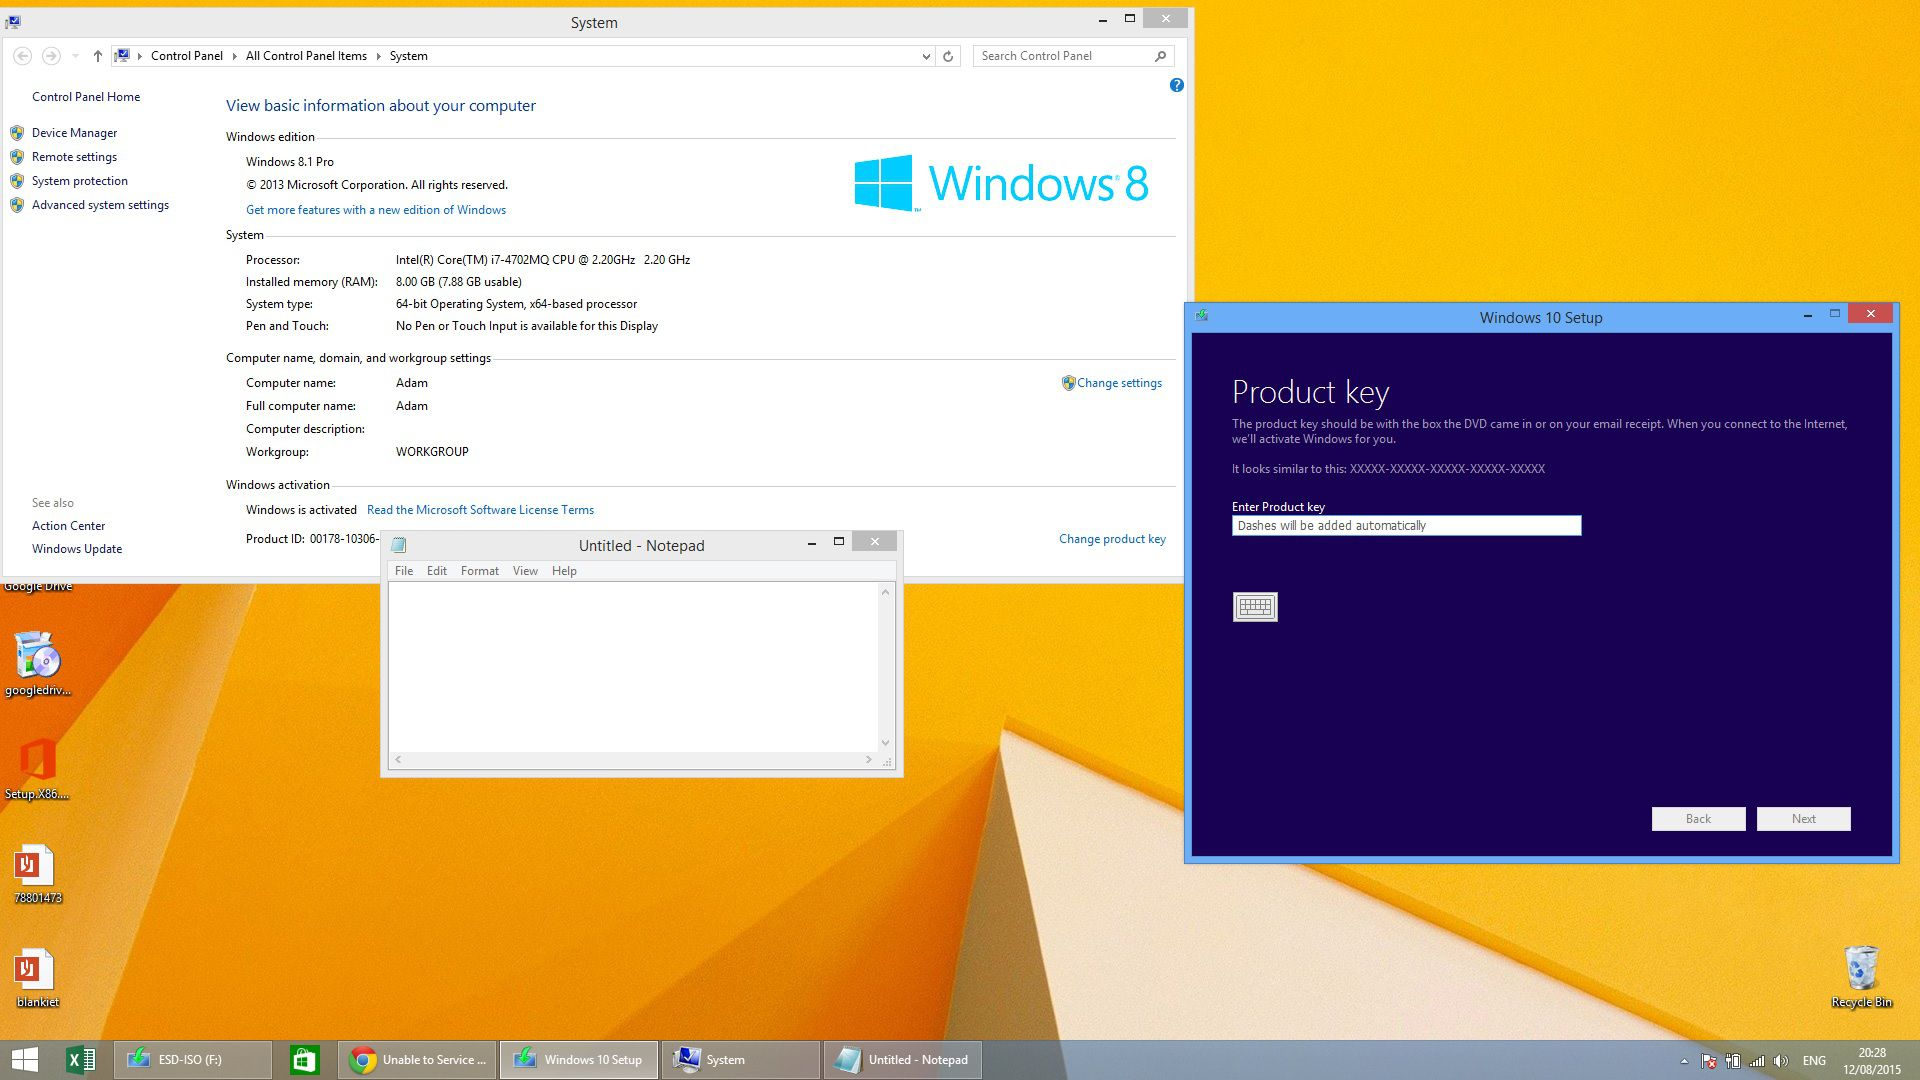 windows 10 2015 product key